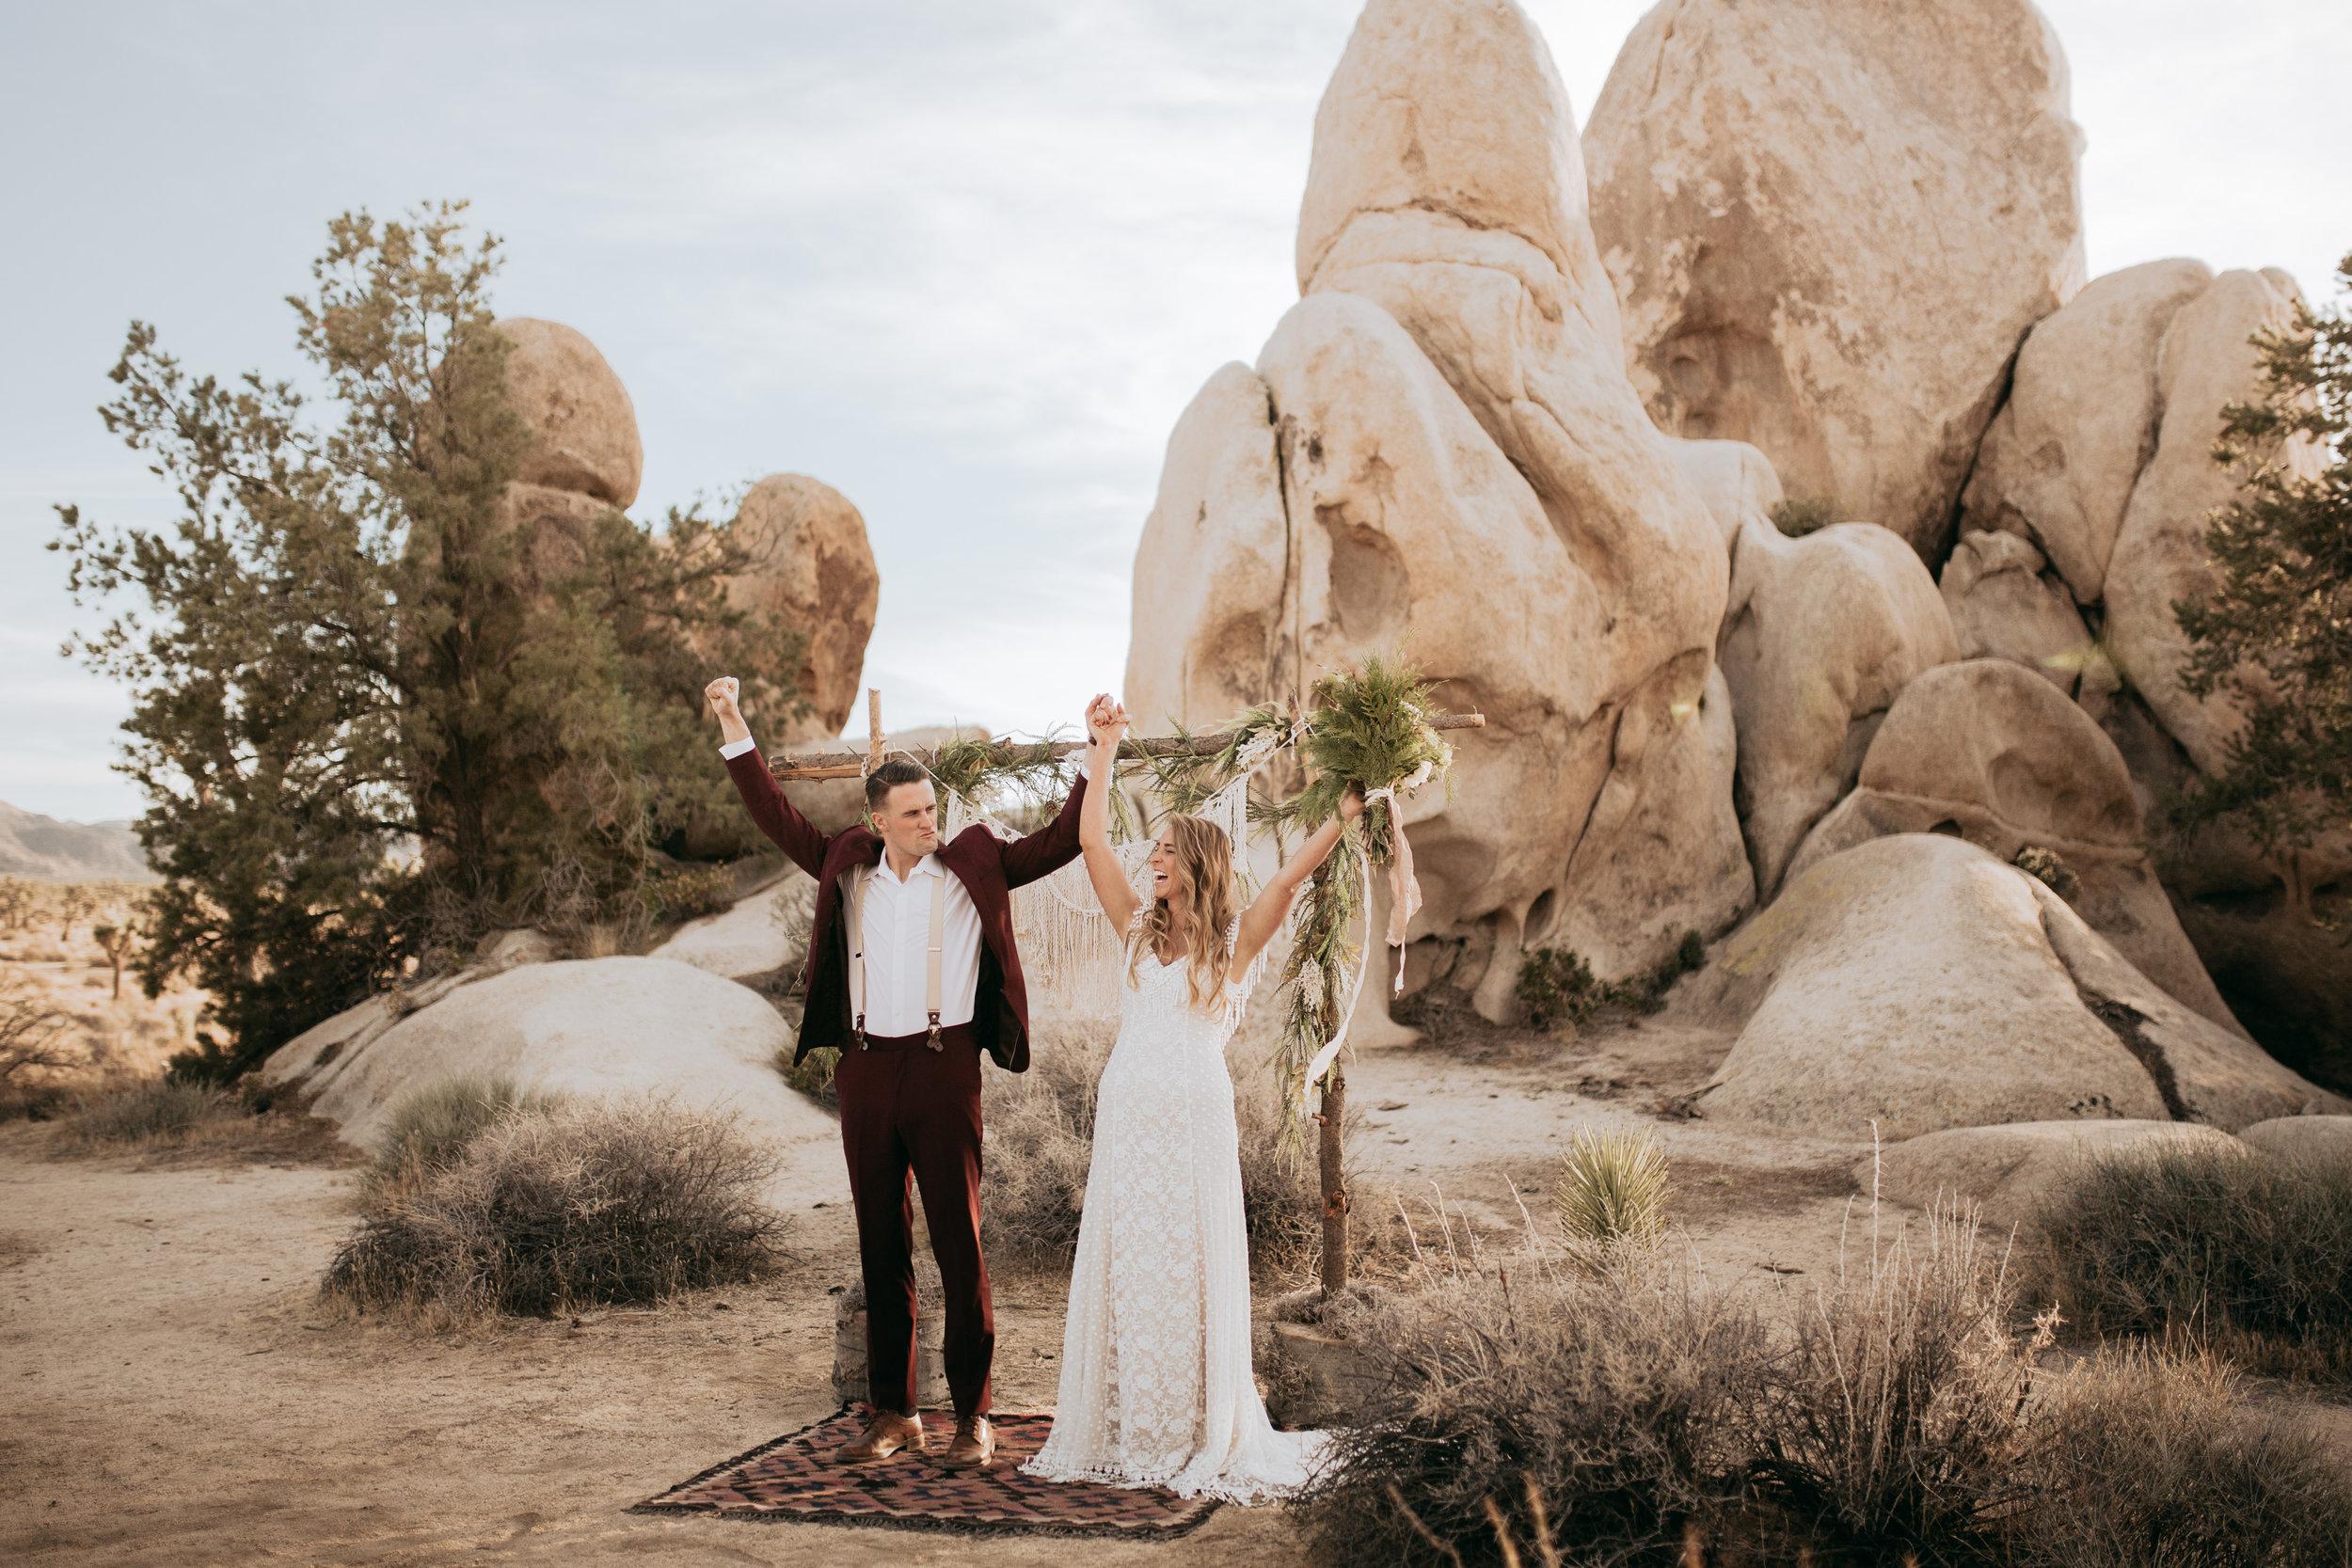 palmsprings_joshuatree_california_wedding_photographer-20.jpg